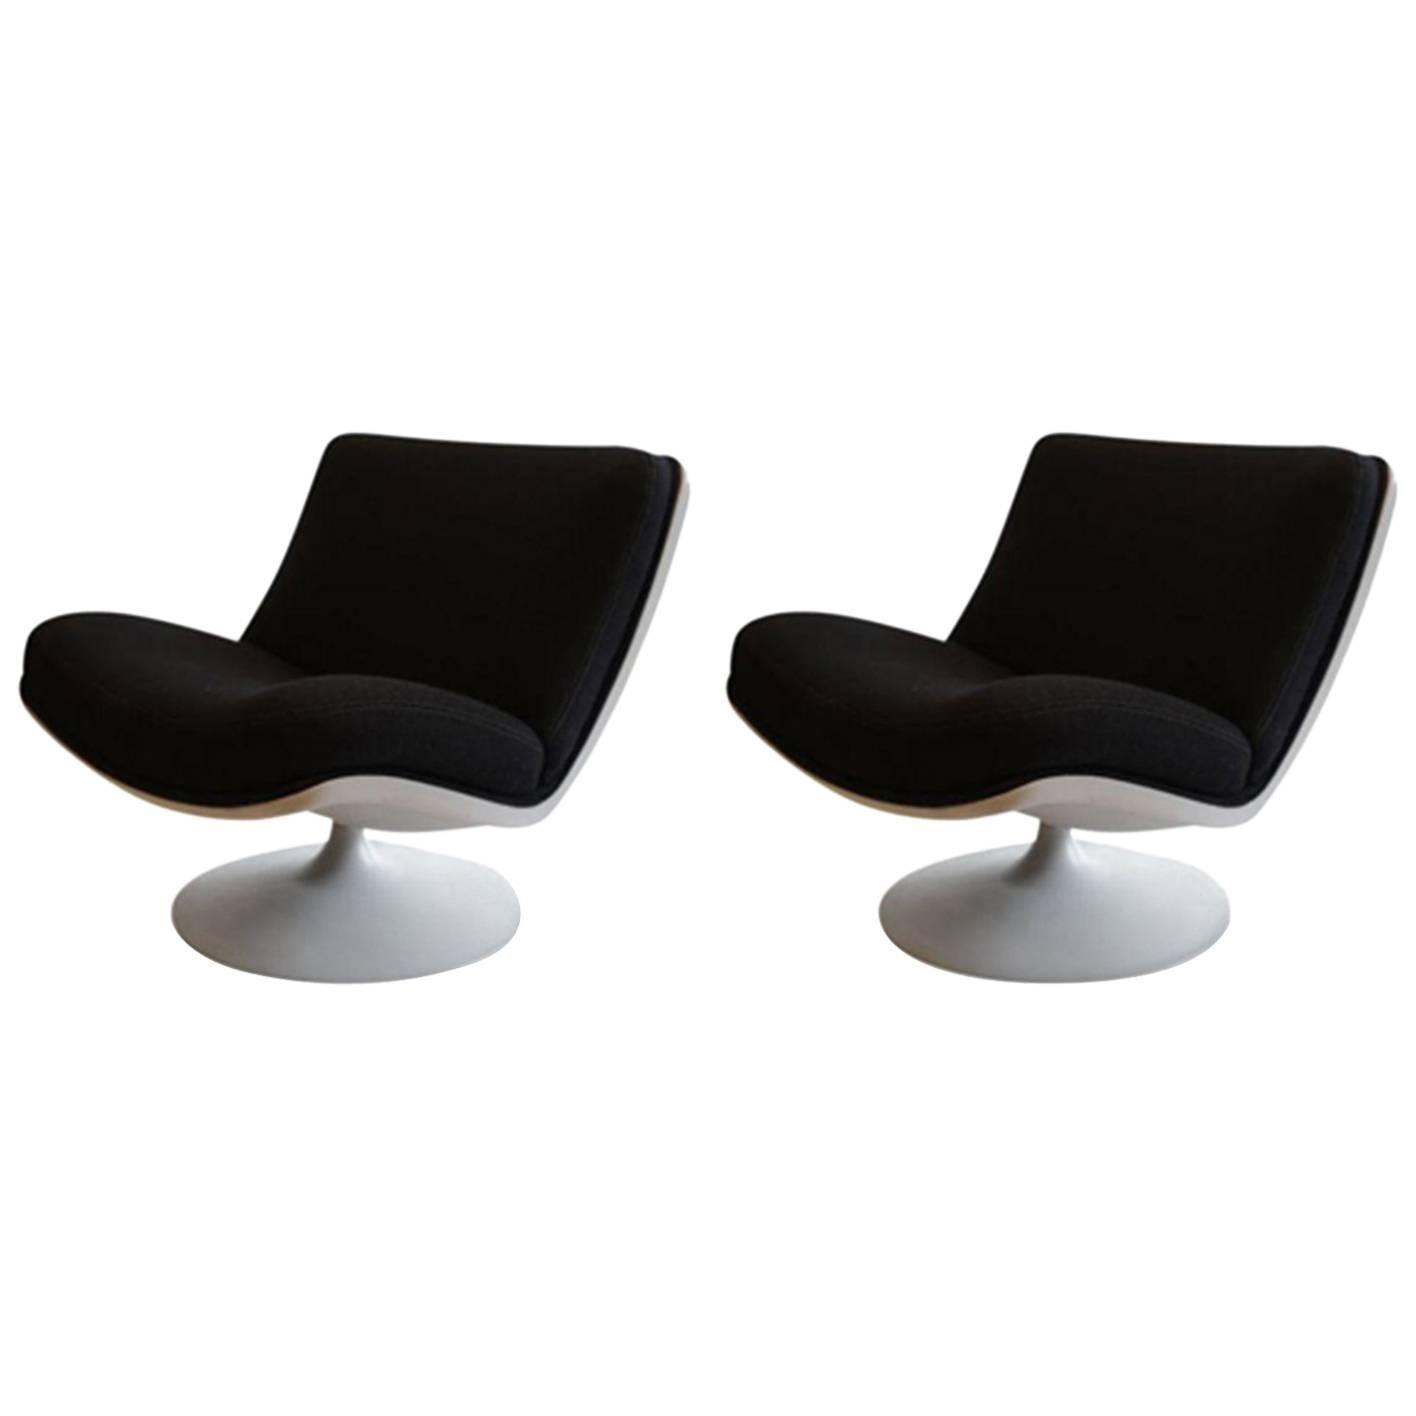 Geoffrey Harcourt For Artifort Vintage F978 Swivel Chairs